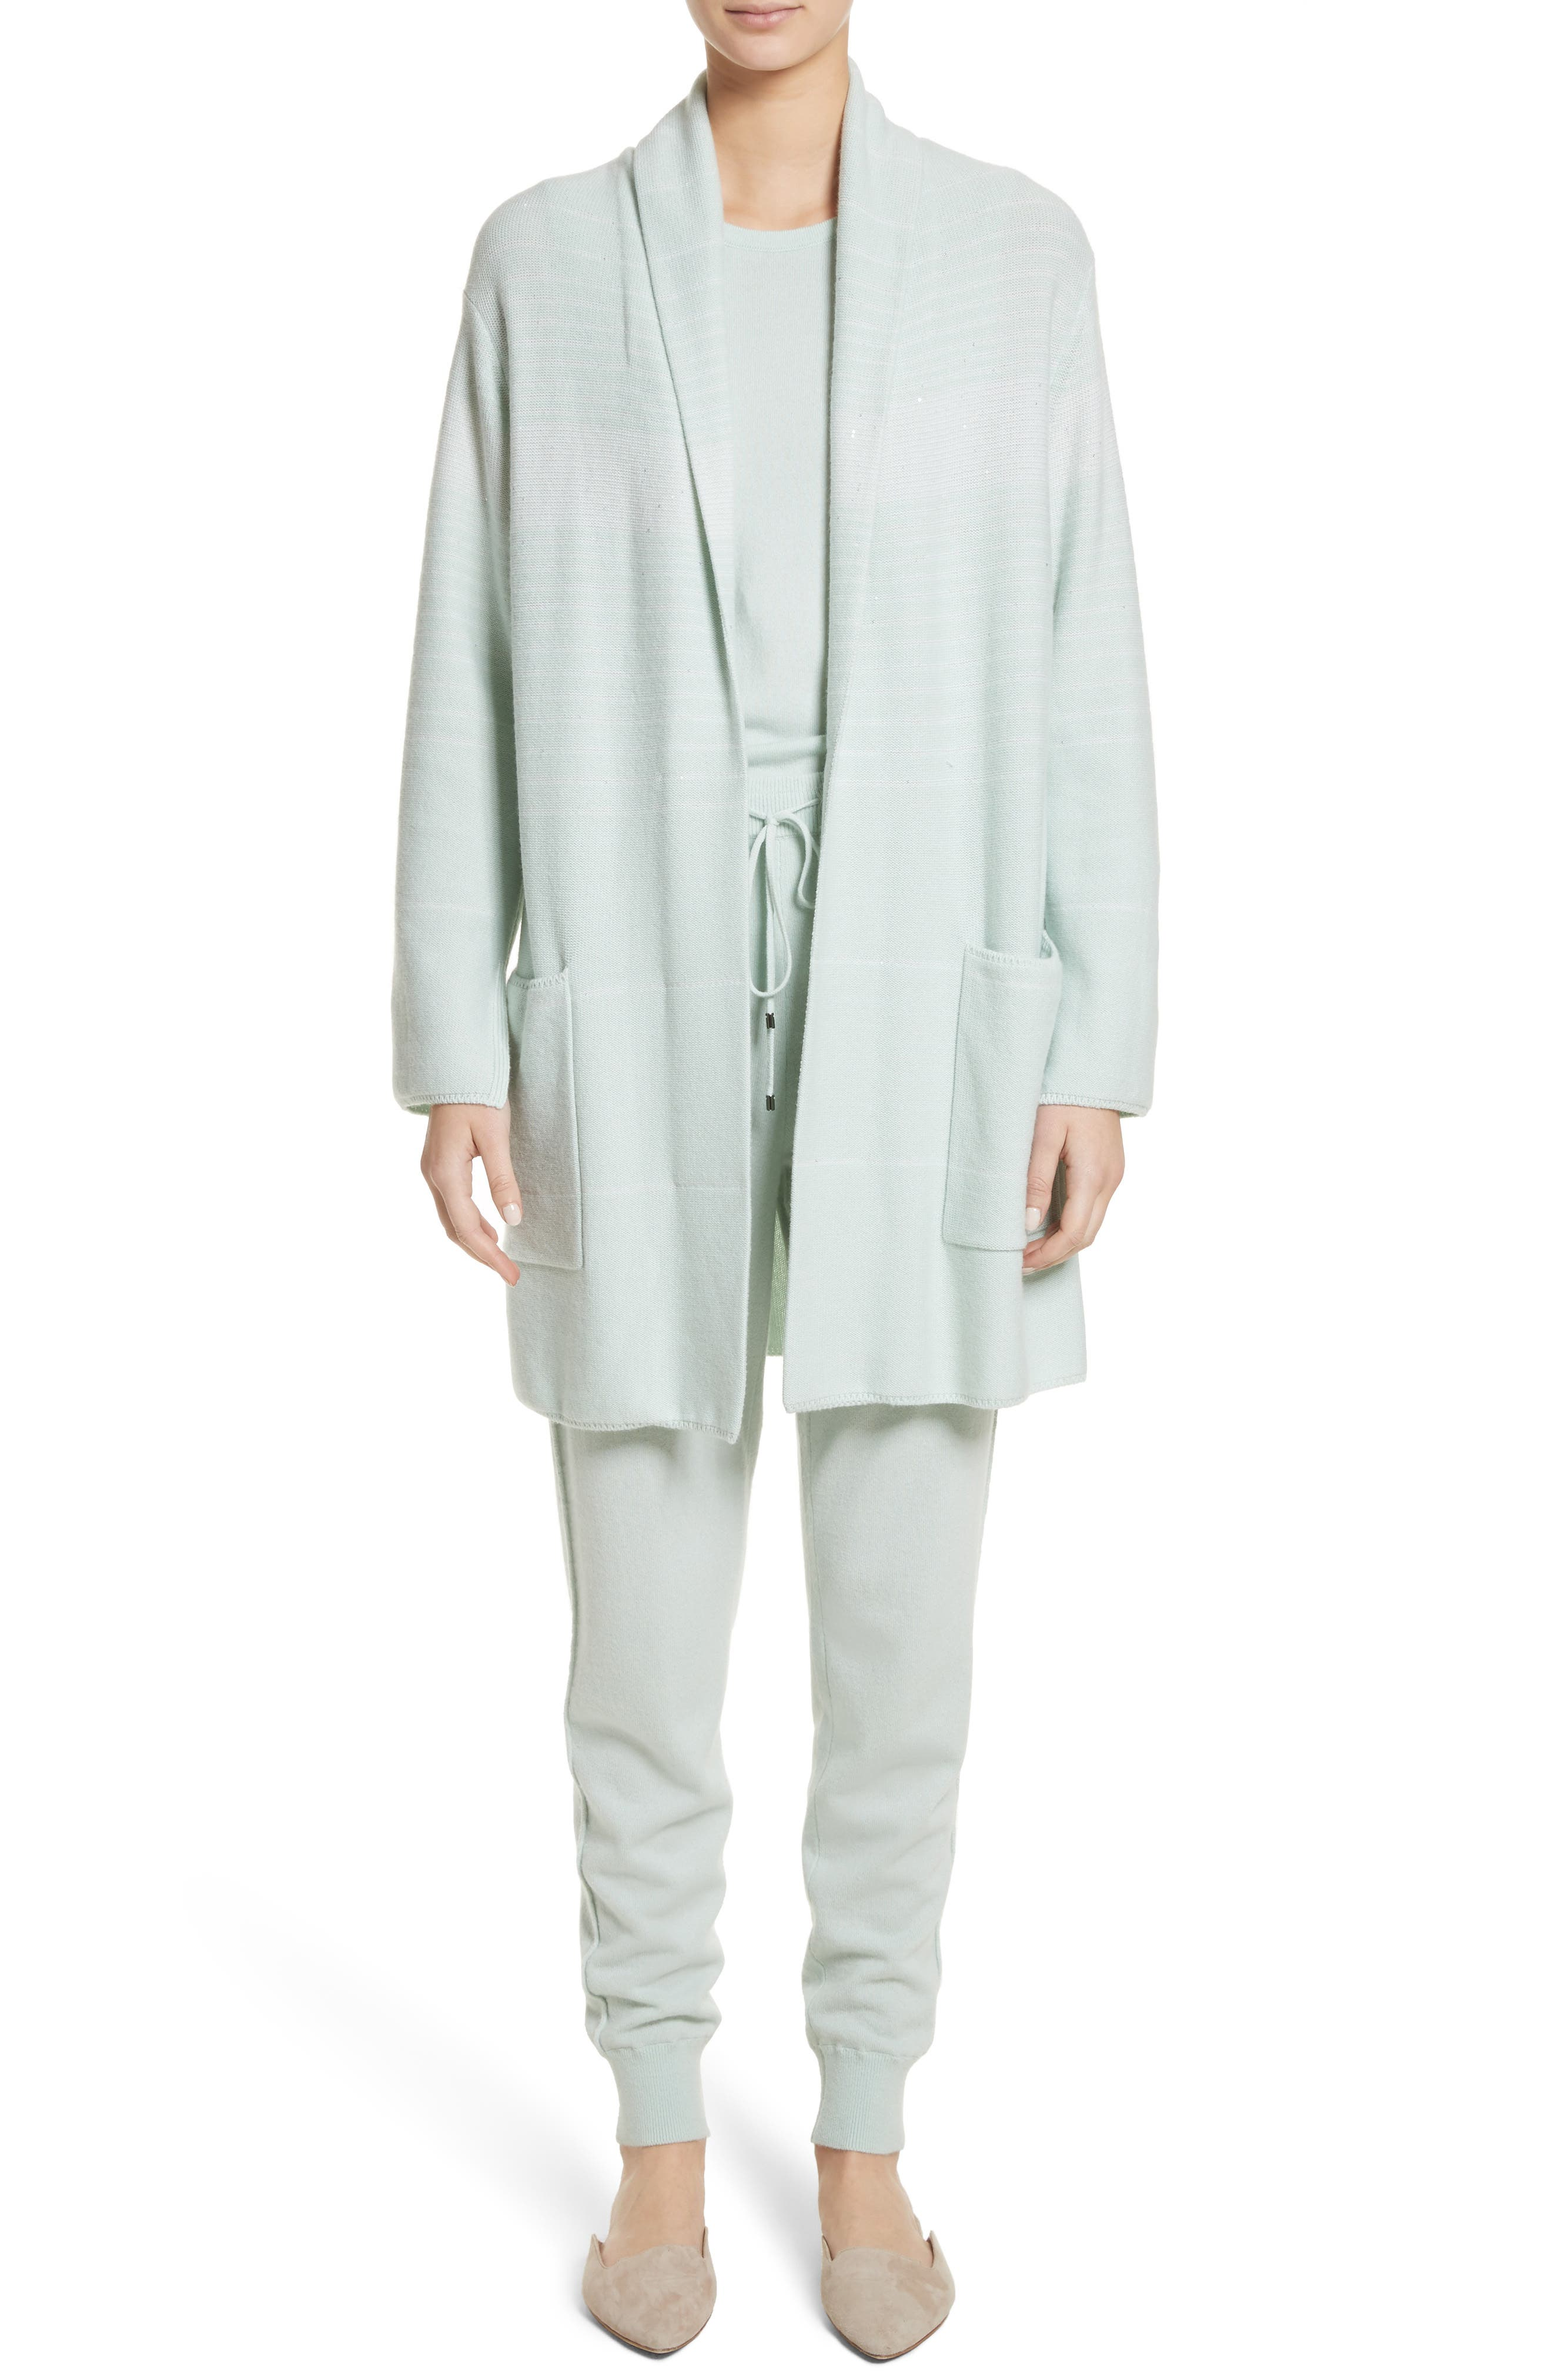 Sequin Cashmere & Silk Cardigan,                             Alternate thumbnail 8, color,                             Mint/ Cream